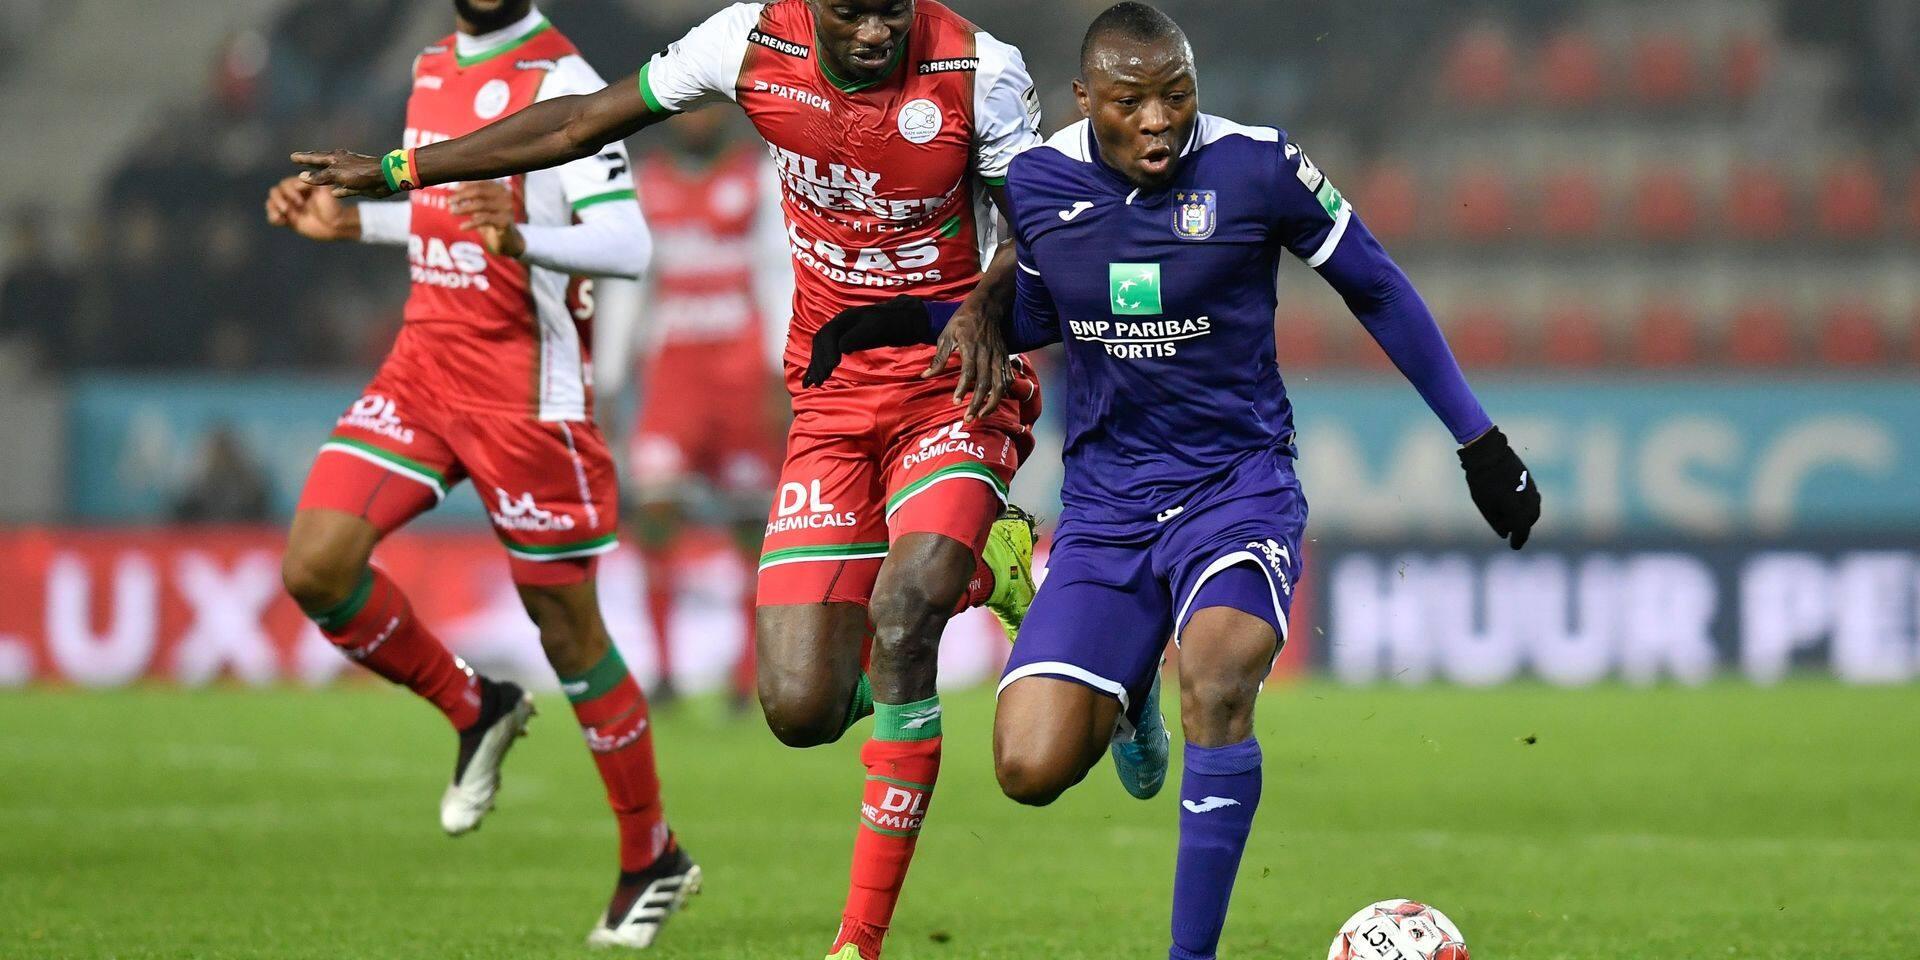 Officiel: Edo Kayembe quitte Anderlecht pour Eupen